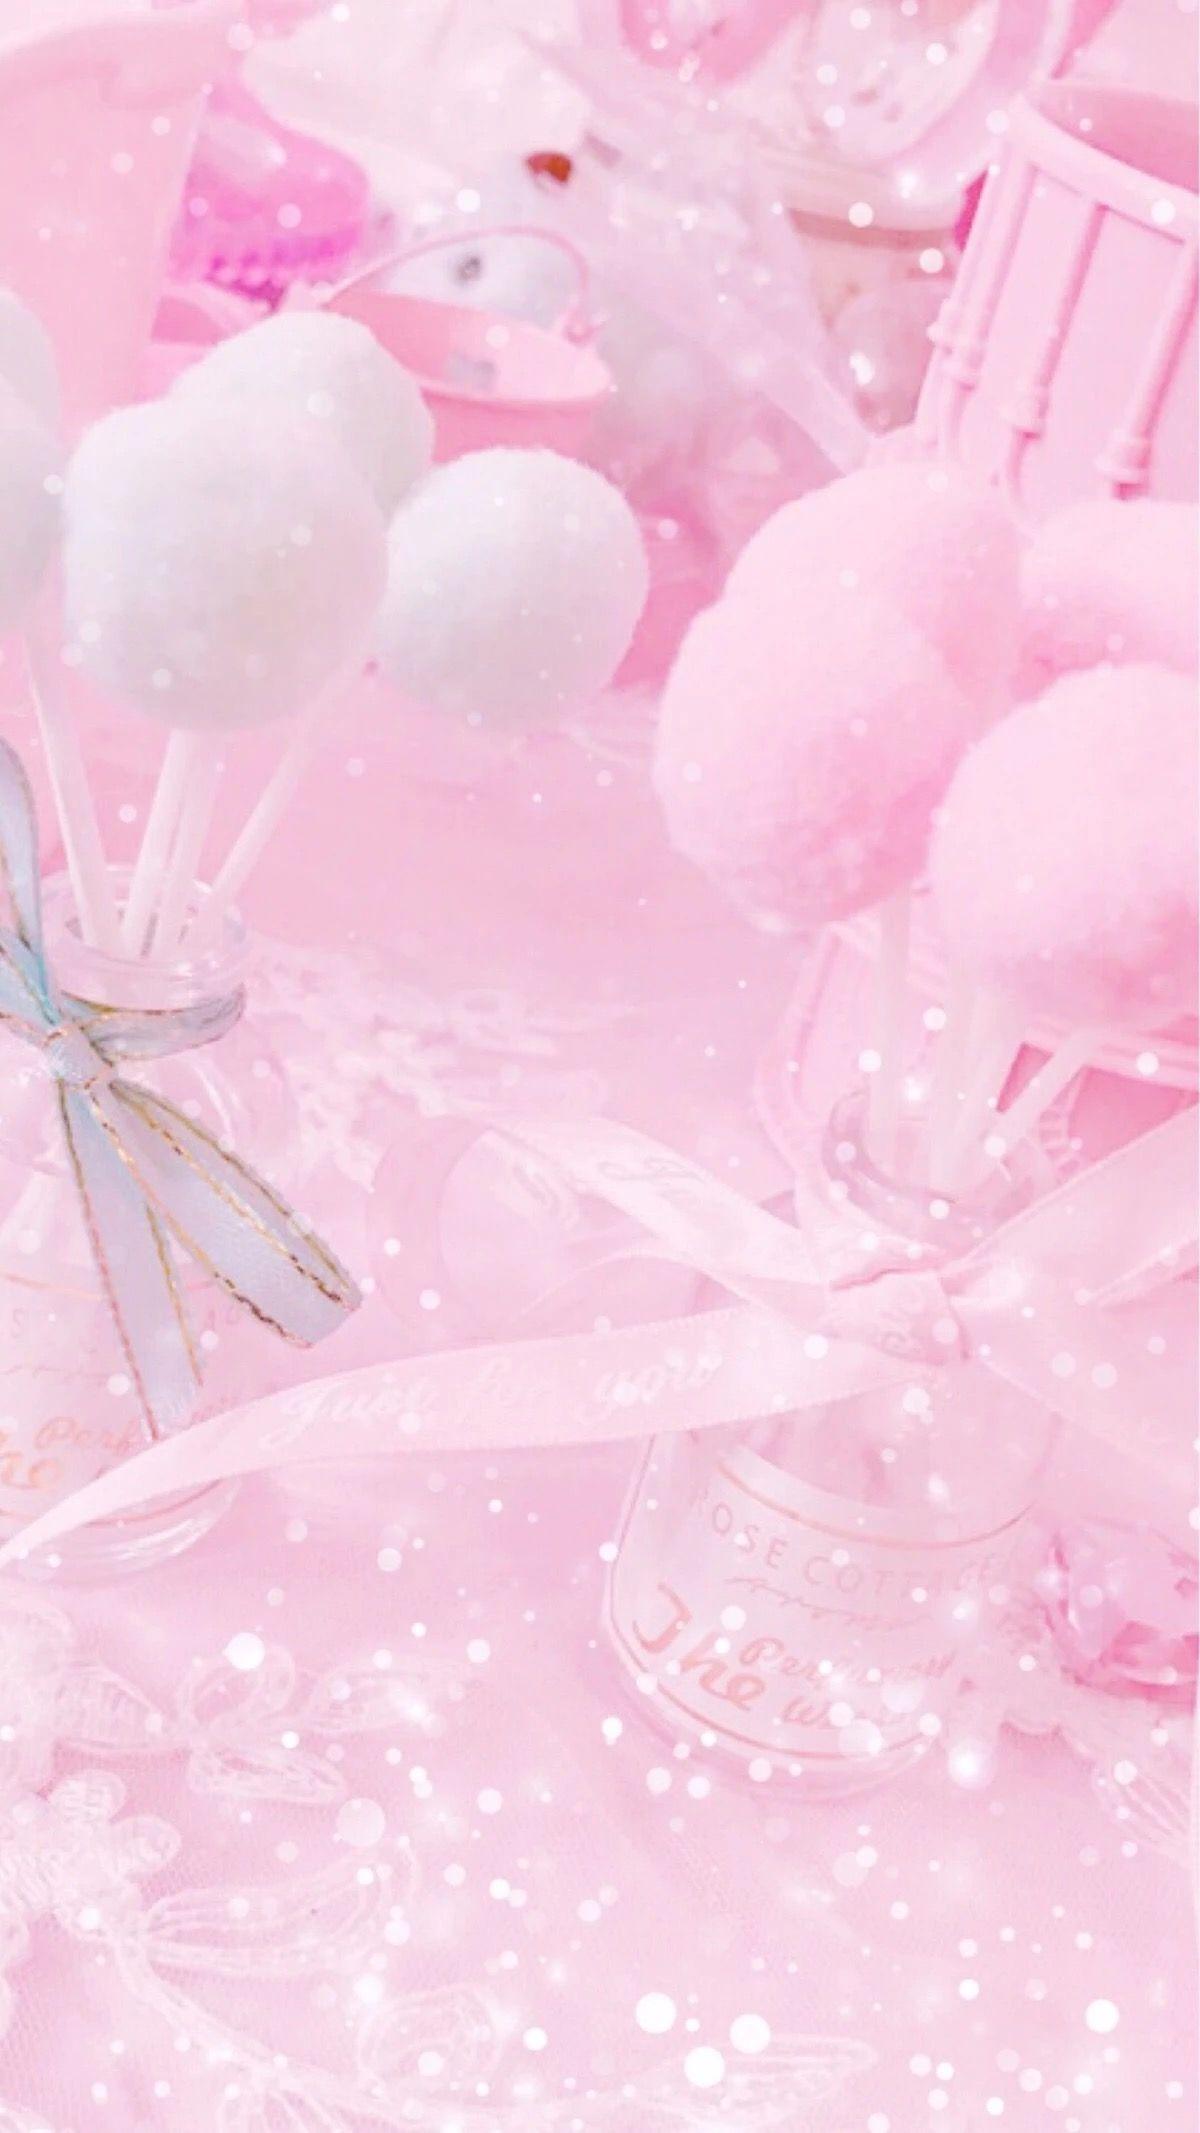 Aesthetic Wallpaper Cute Pink